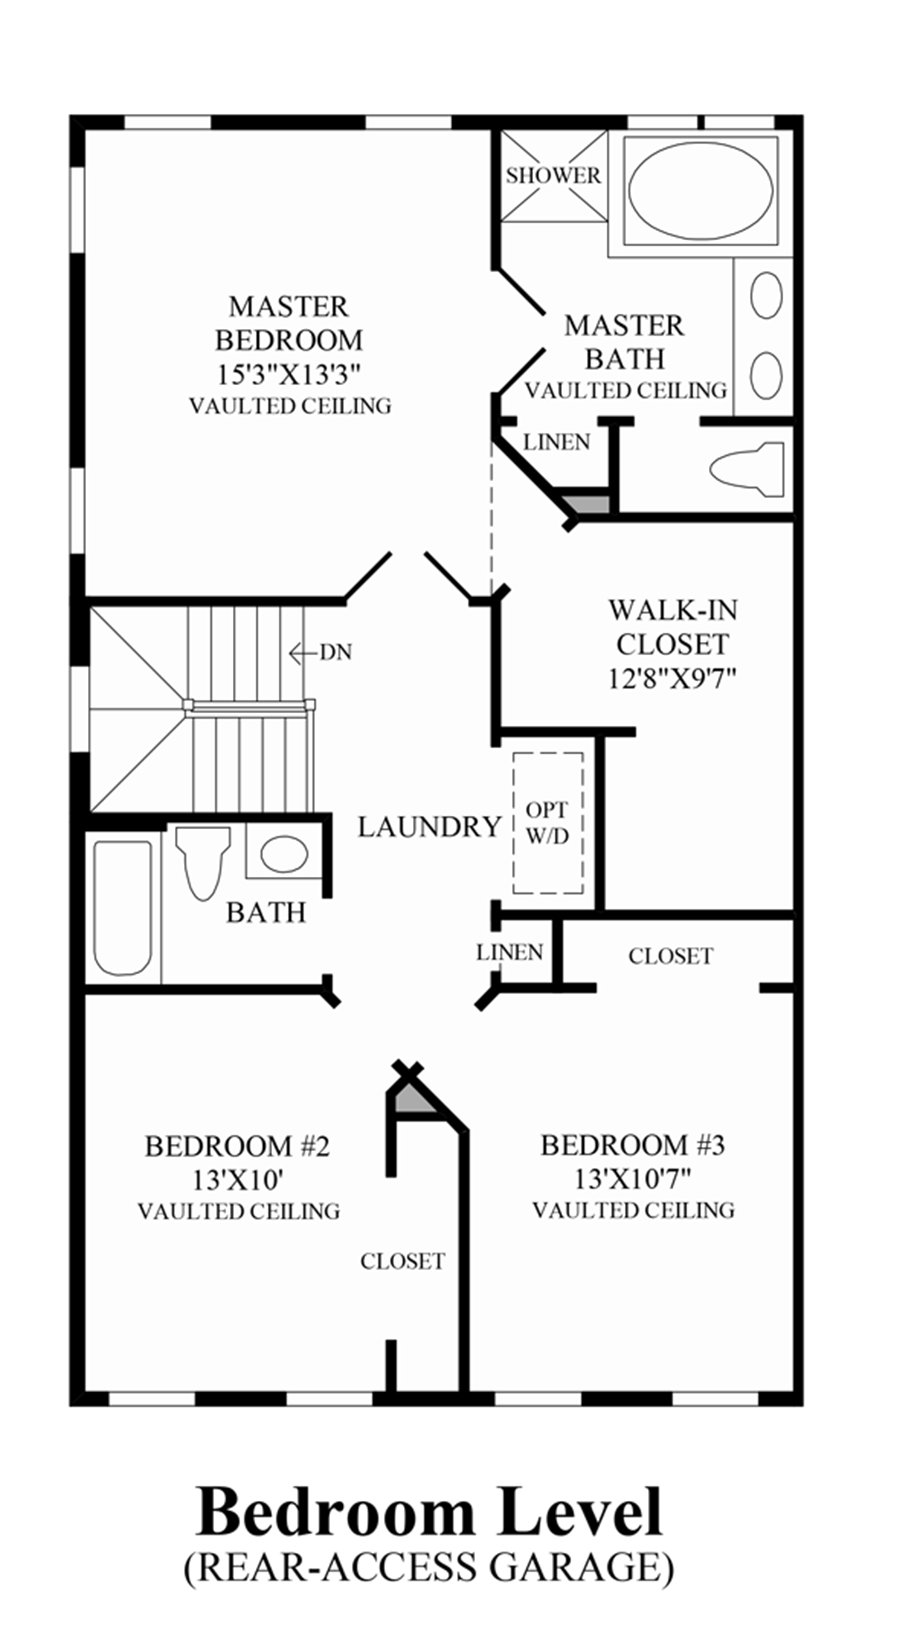 Ravenscliff at media townhomes the easton home design for Design your own bedroom floor plan